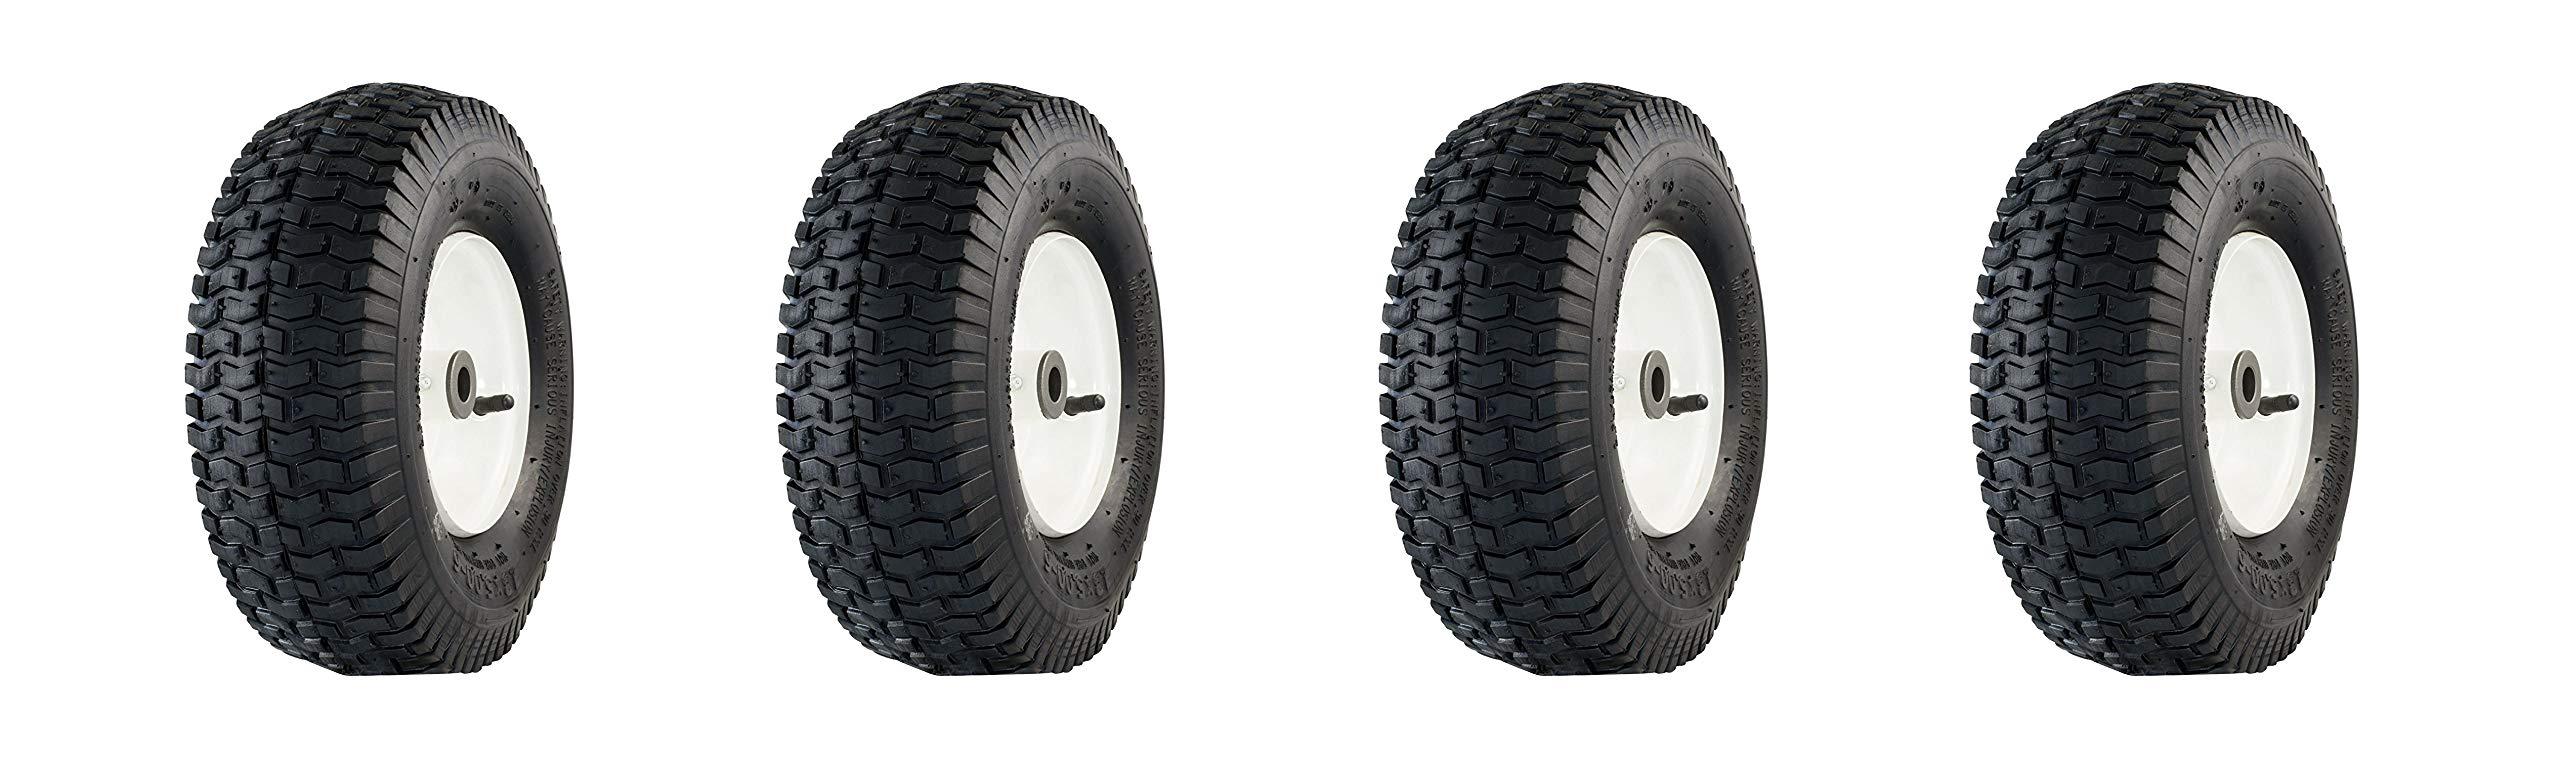 Marathon 13x5.00-6'' Pneumatic (Air Filled) Tire on Wheel, 3'' Hub, 3/4 Bushings (Pack of 4) by Marathon Industries